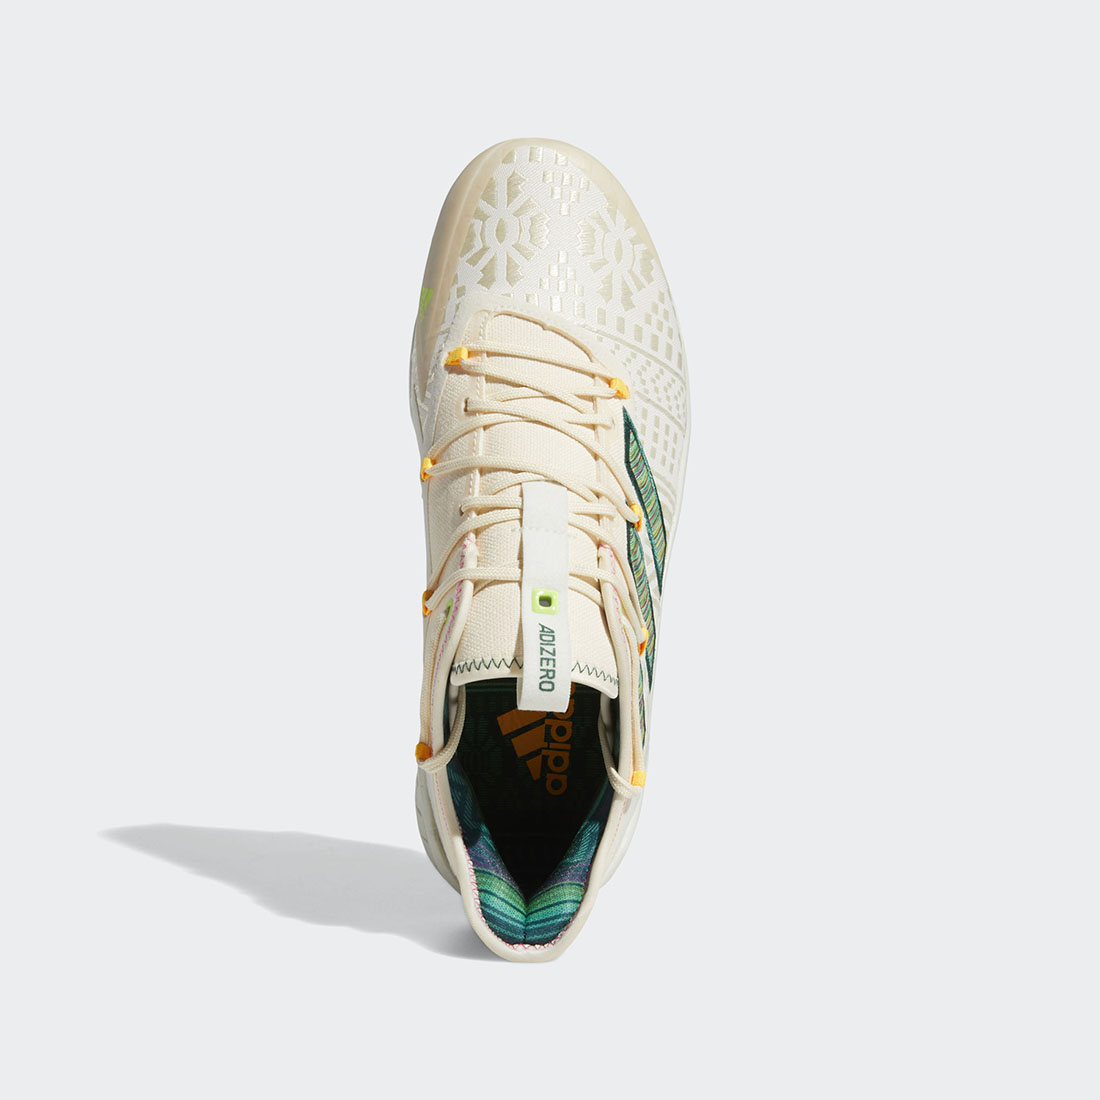 adidas Adizero Afterburner 8 Hispanic Heritage Cleats